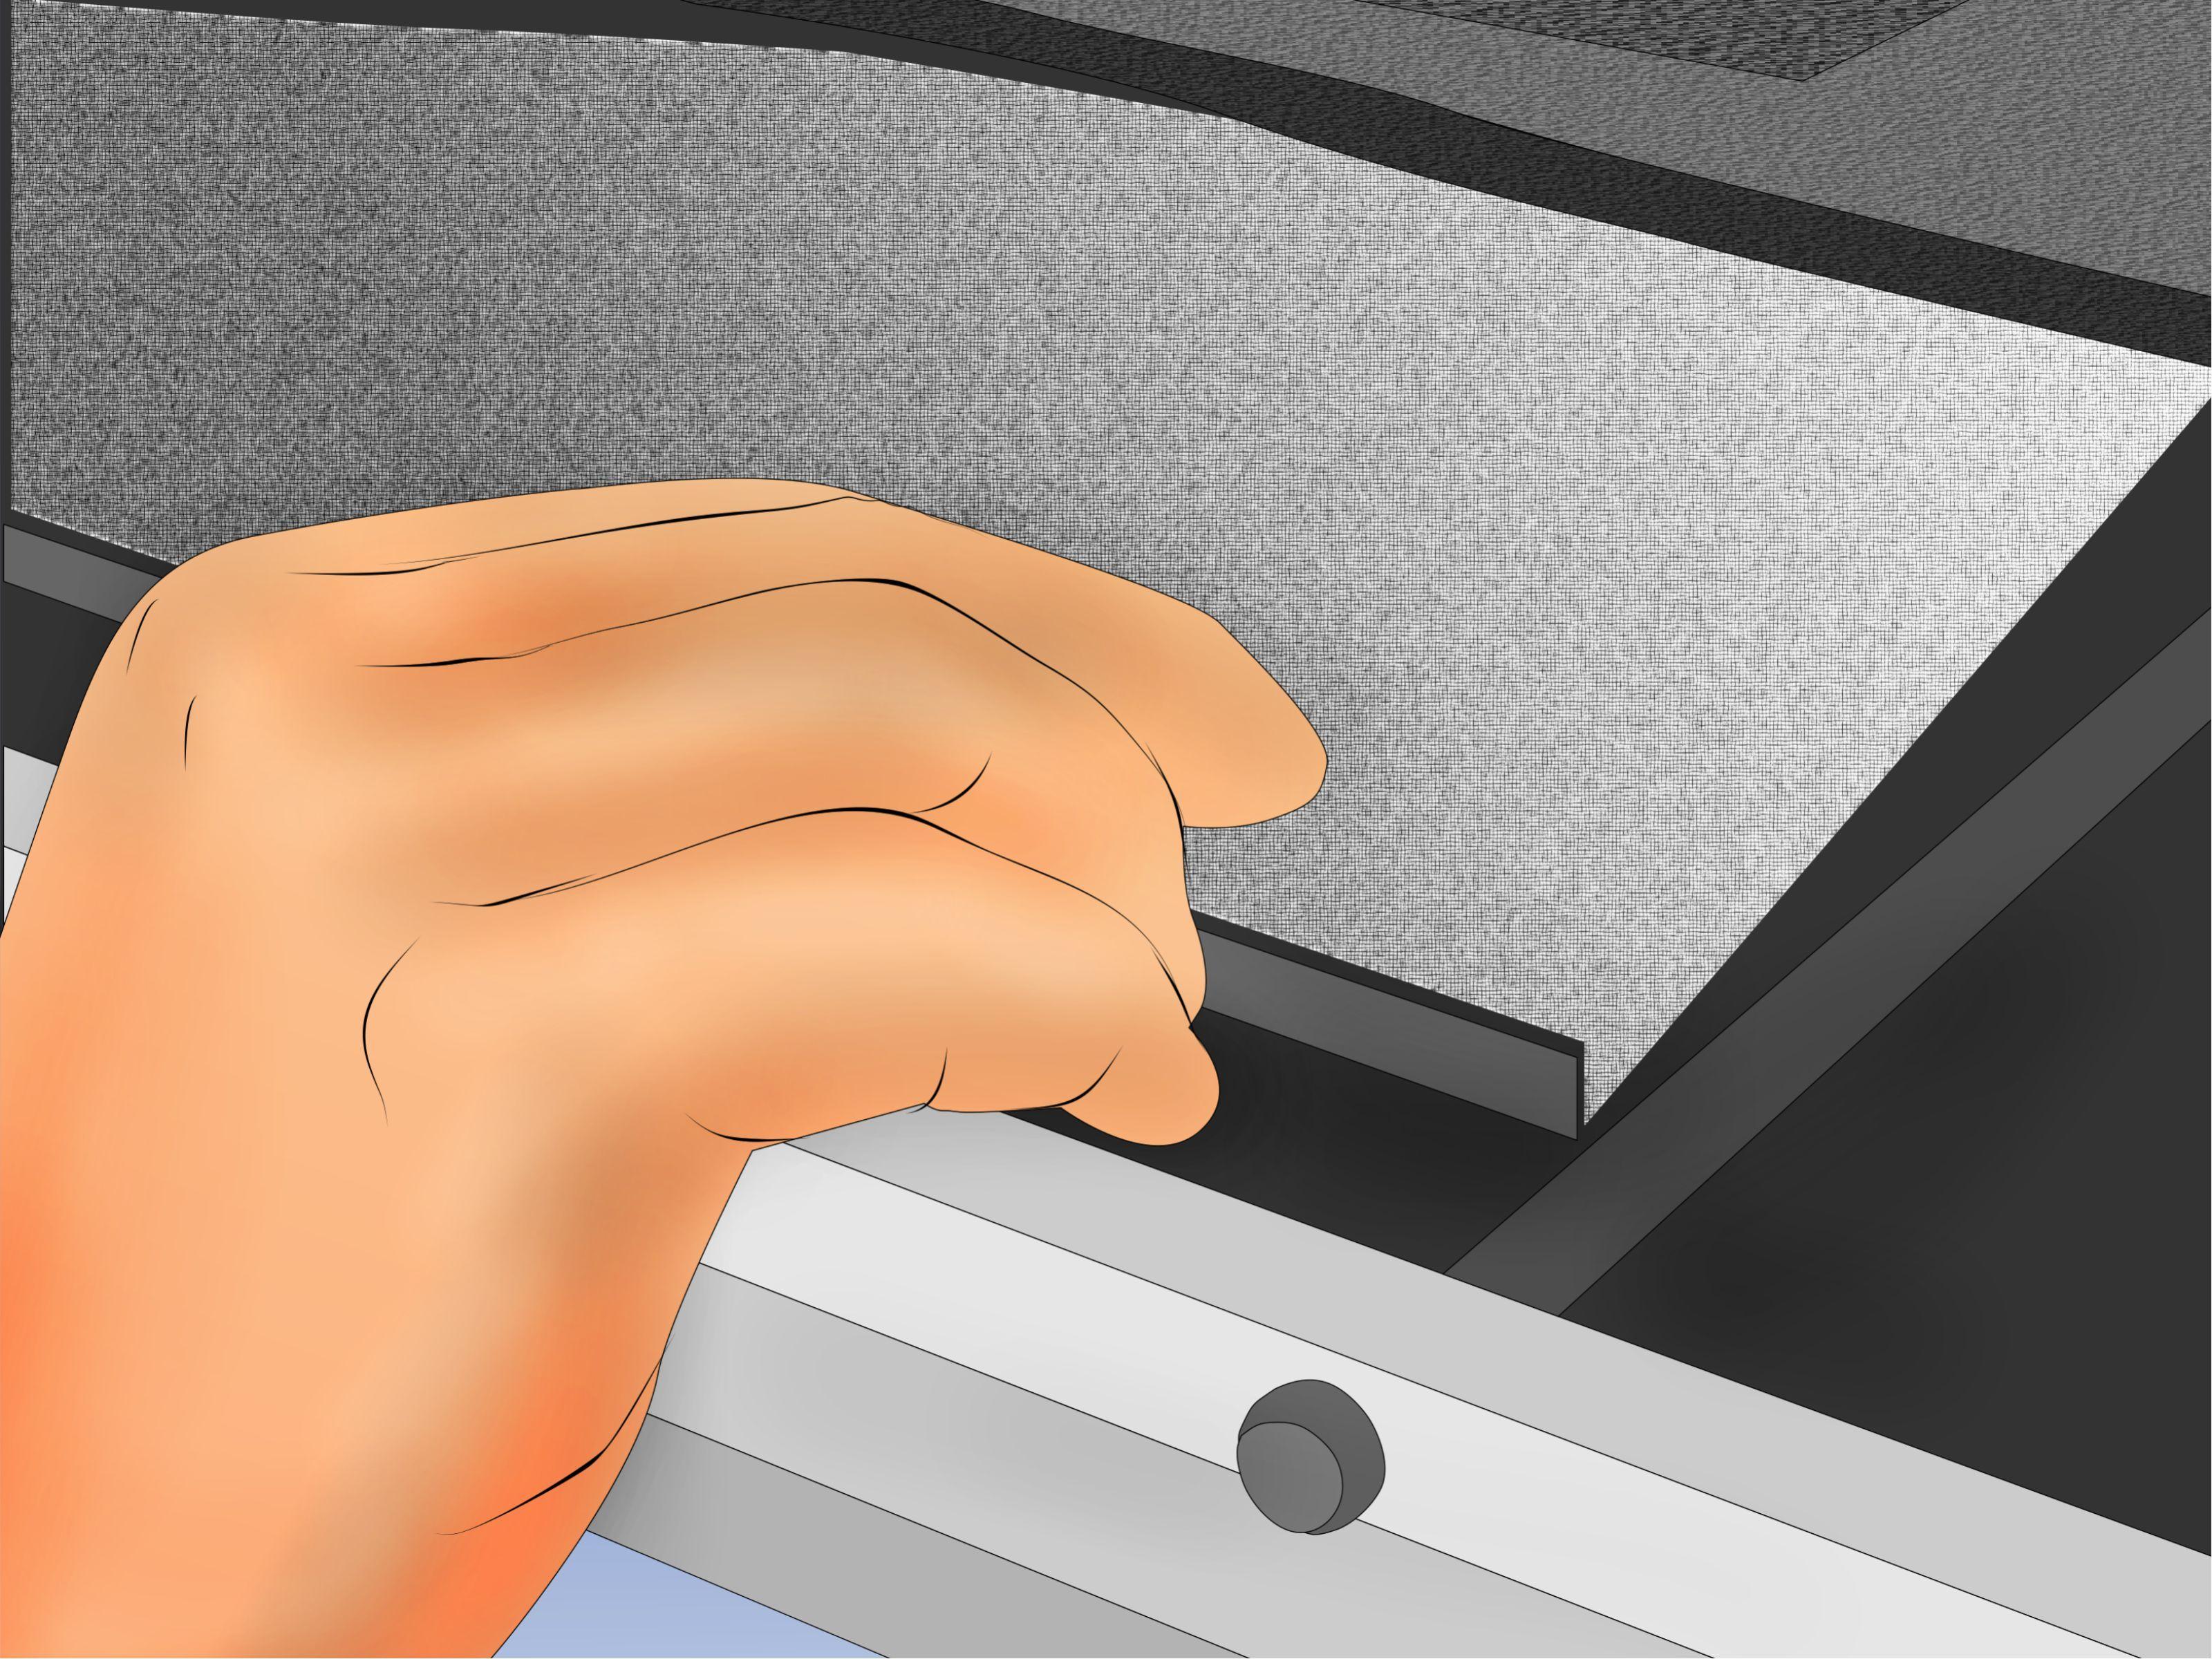 Install Vinyl Gutters How To Install Gutters Diy Gutters Home Fix